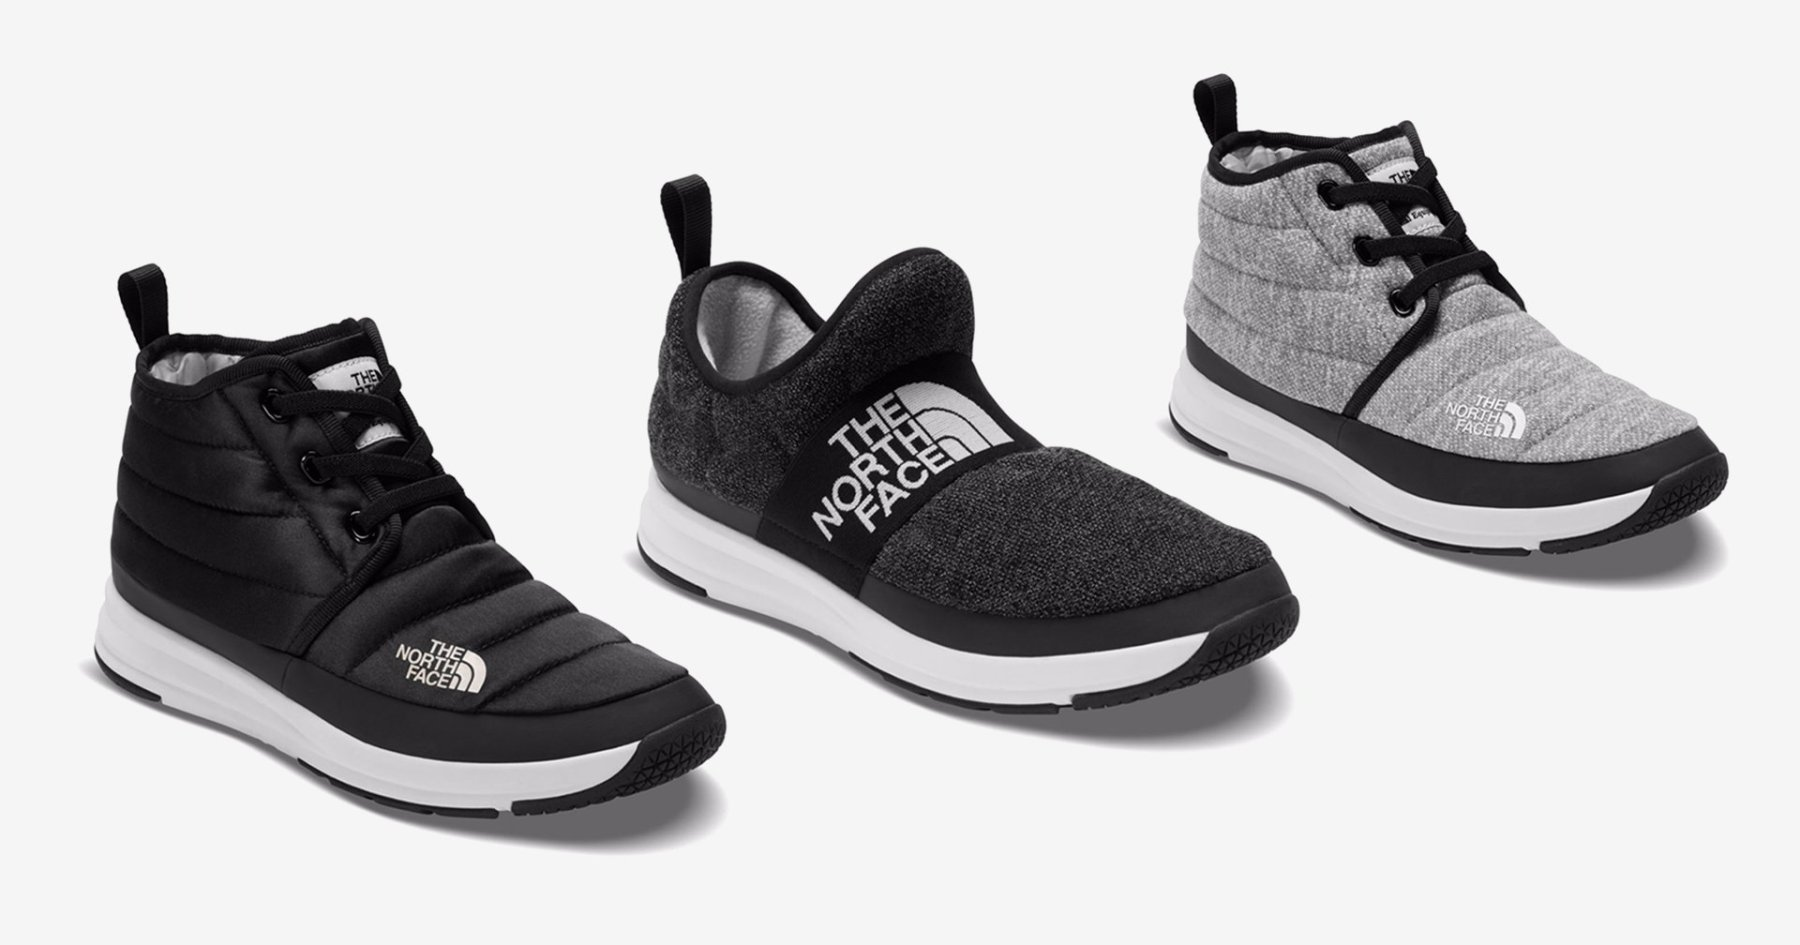 sale retailer b0f3c b1a29 Winter Sneakers   Kaufeneue